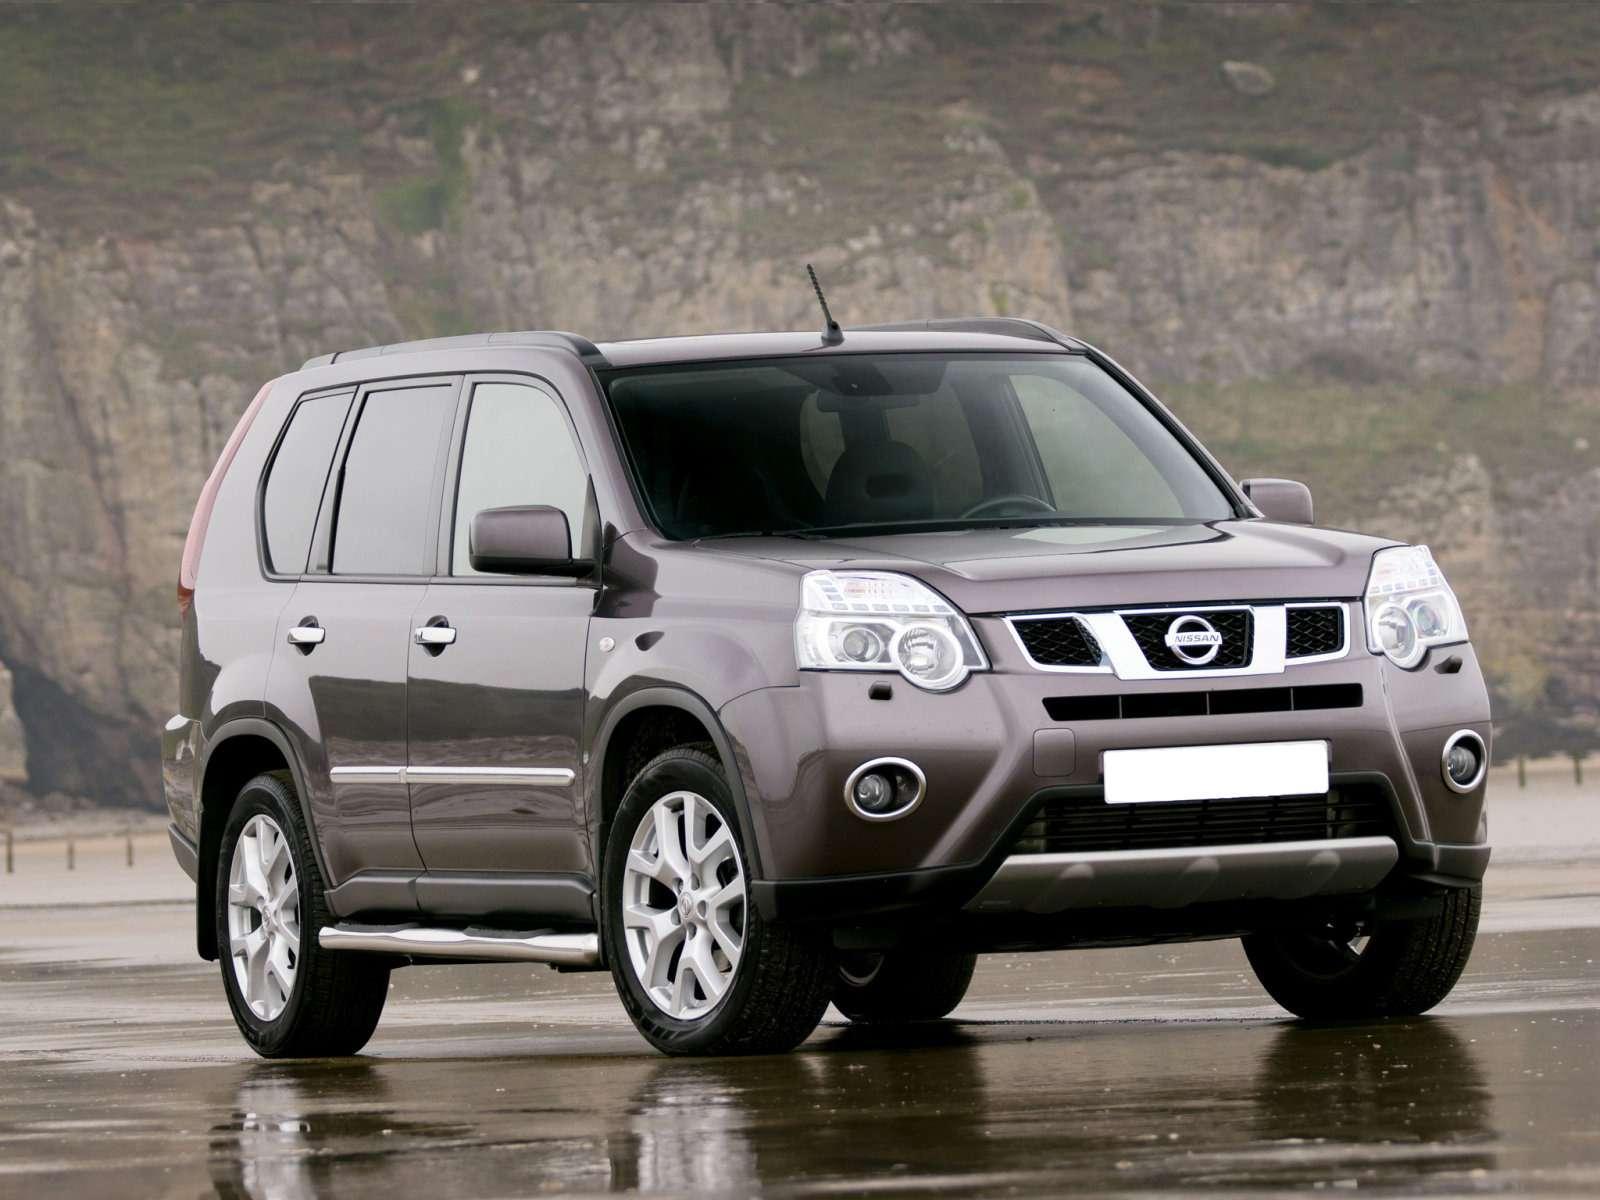 Nissan_X-Trail_SUV 5door_2011